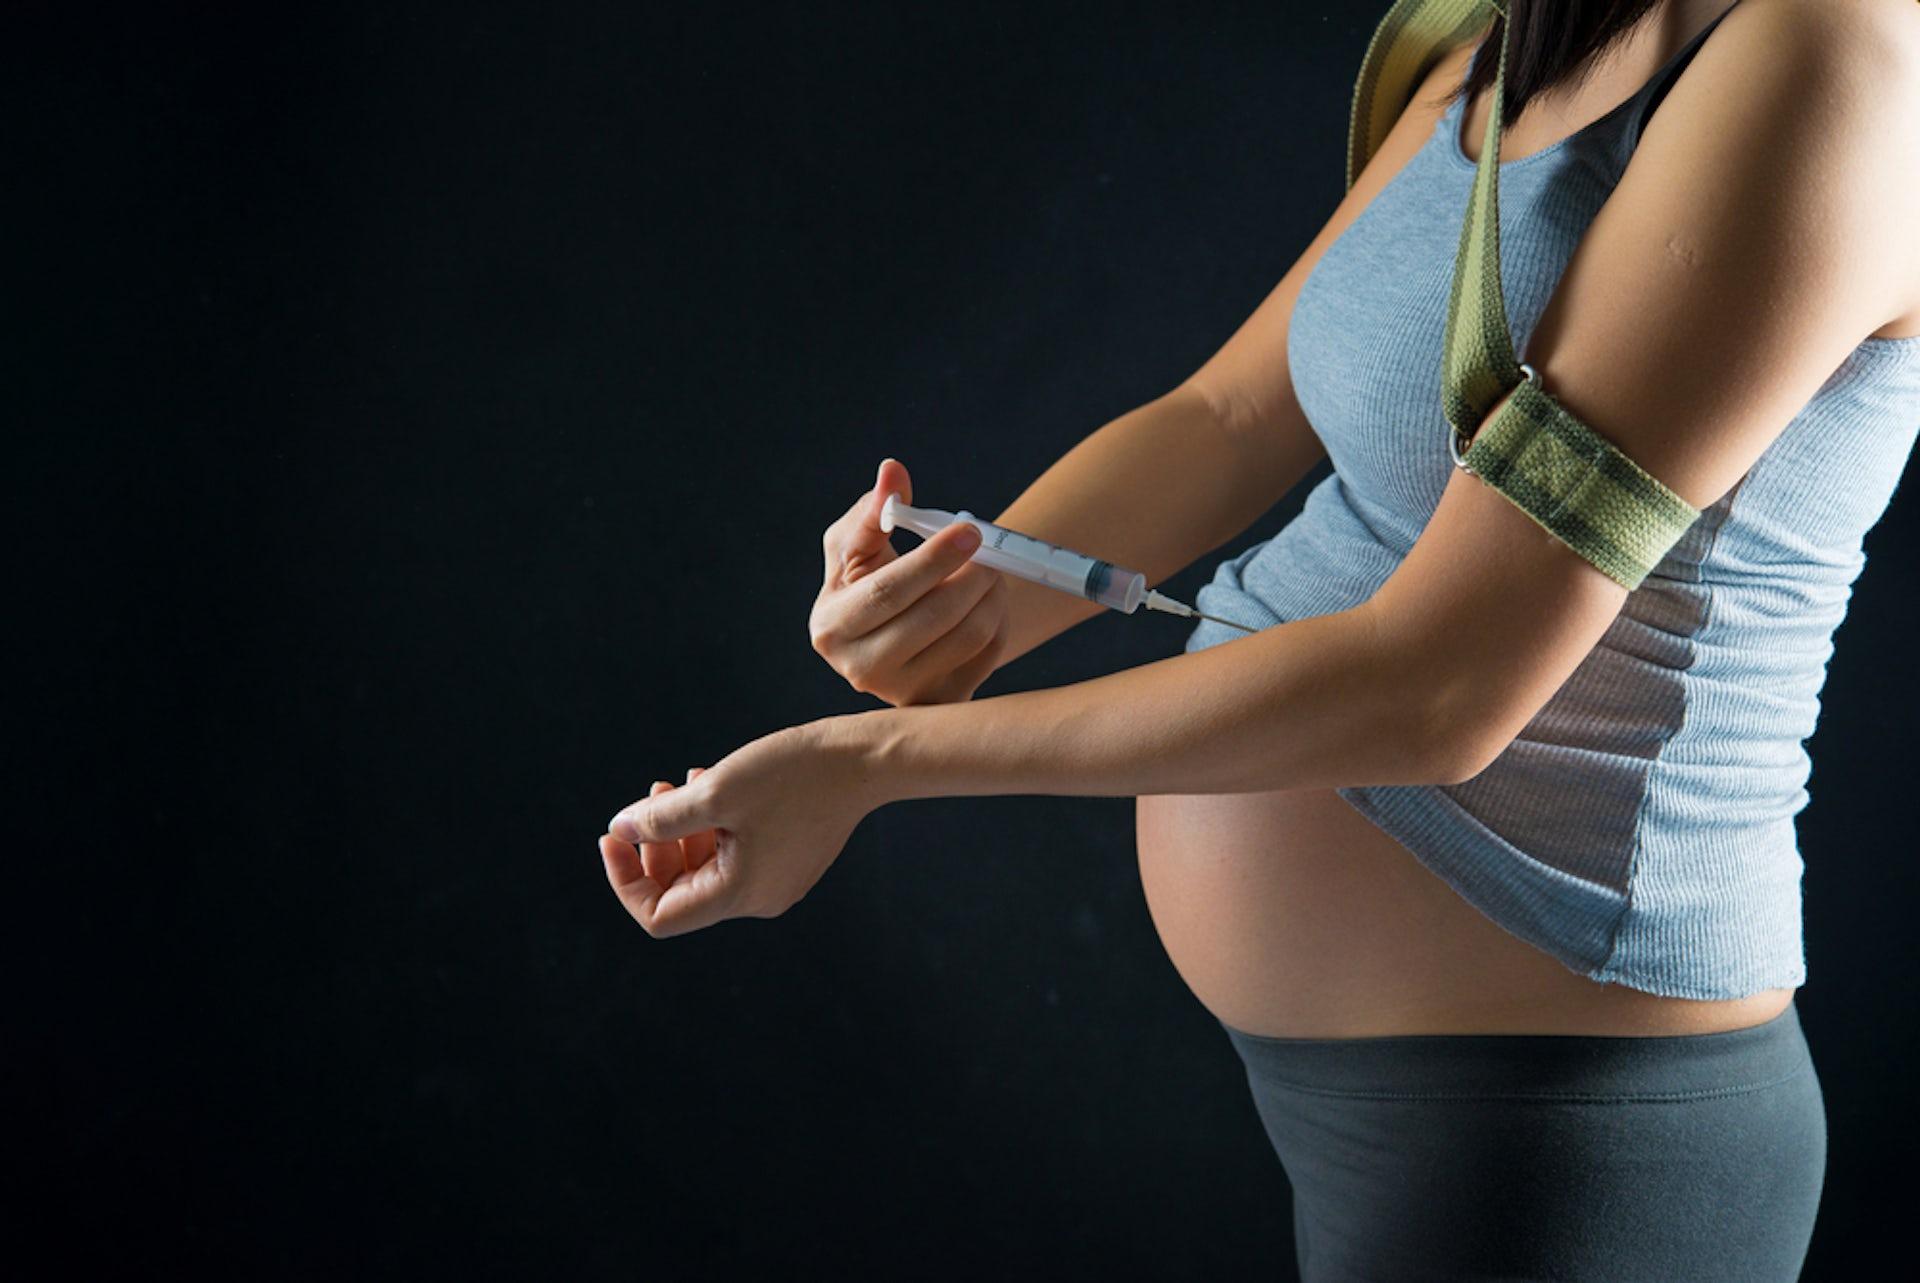 Cocaine addiction among pregnant women